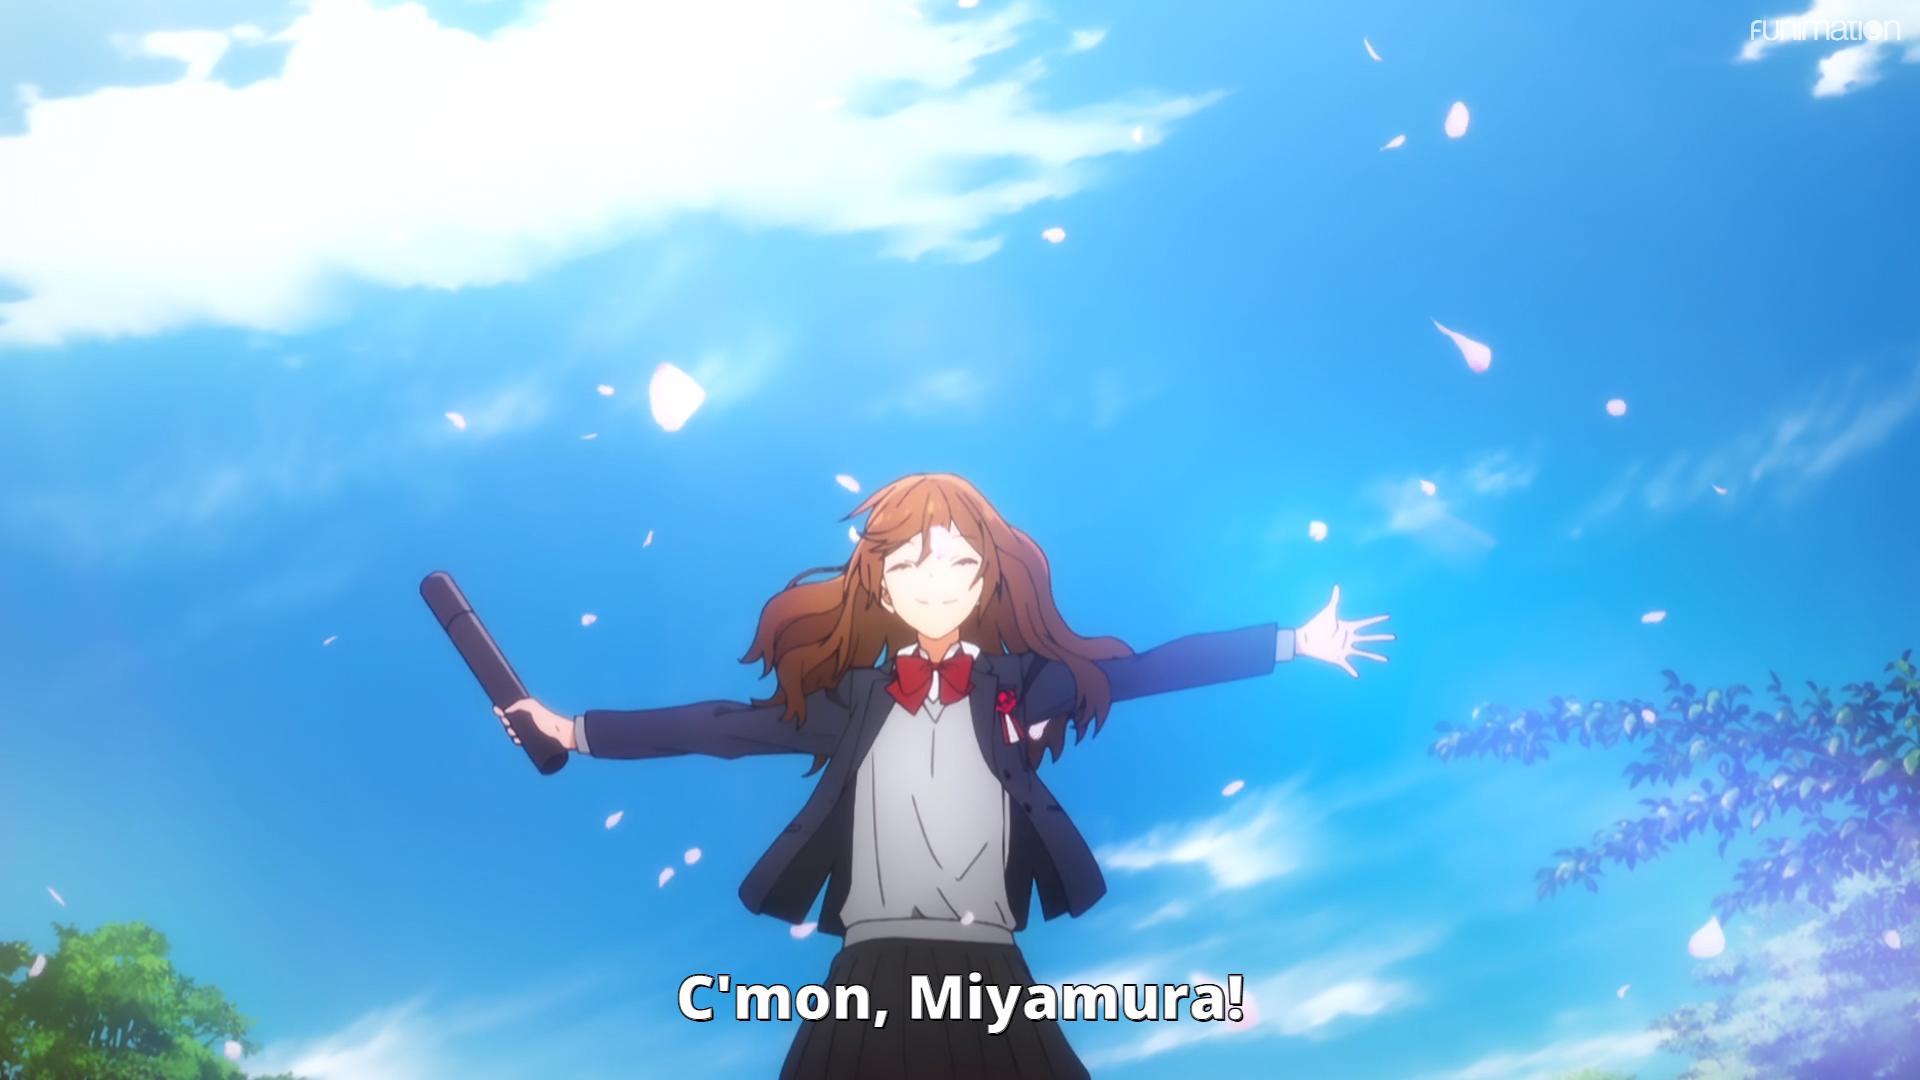 Horimiya Season 1 Episode 13